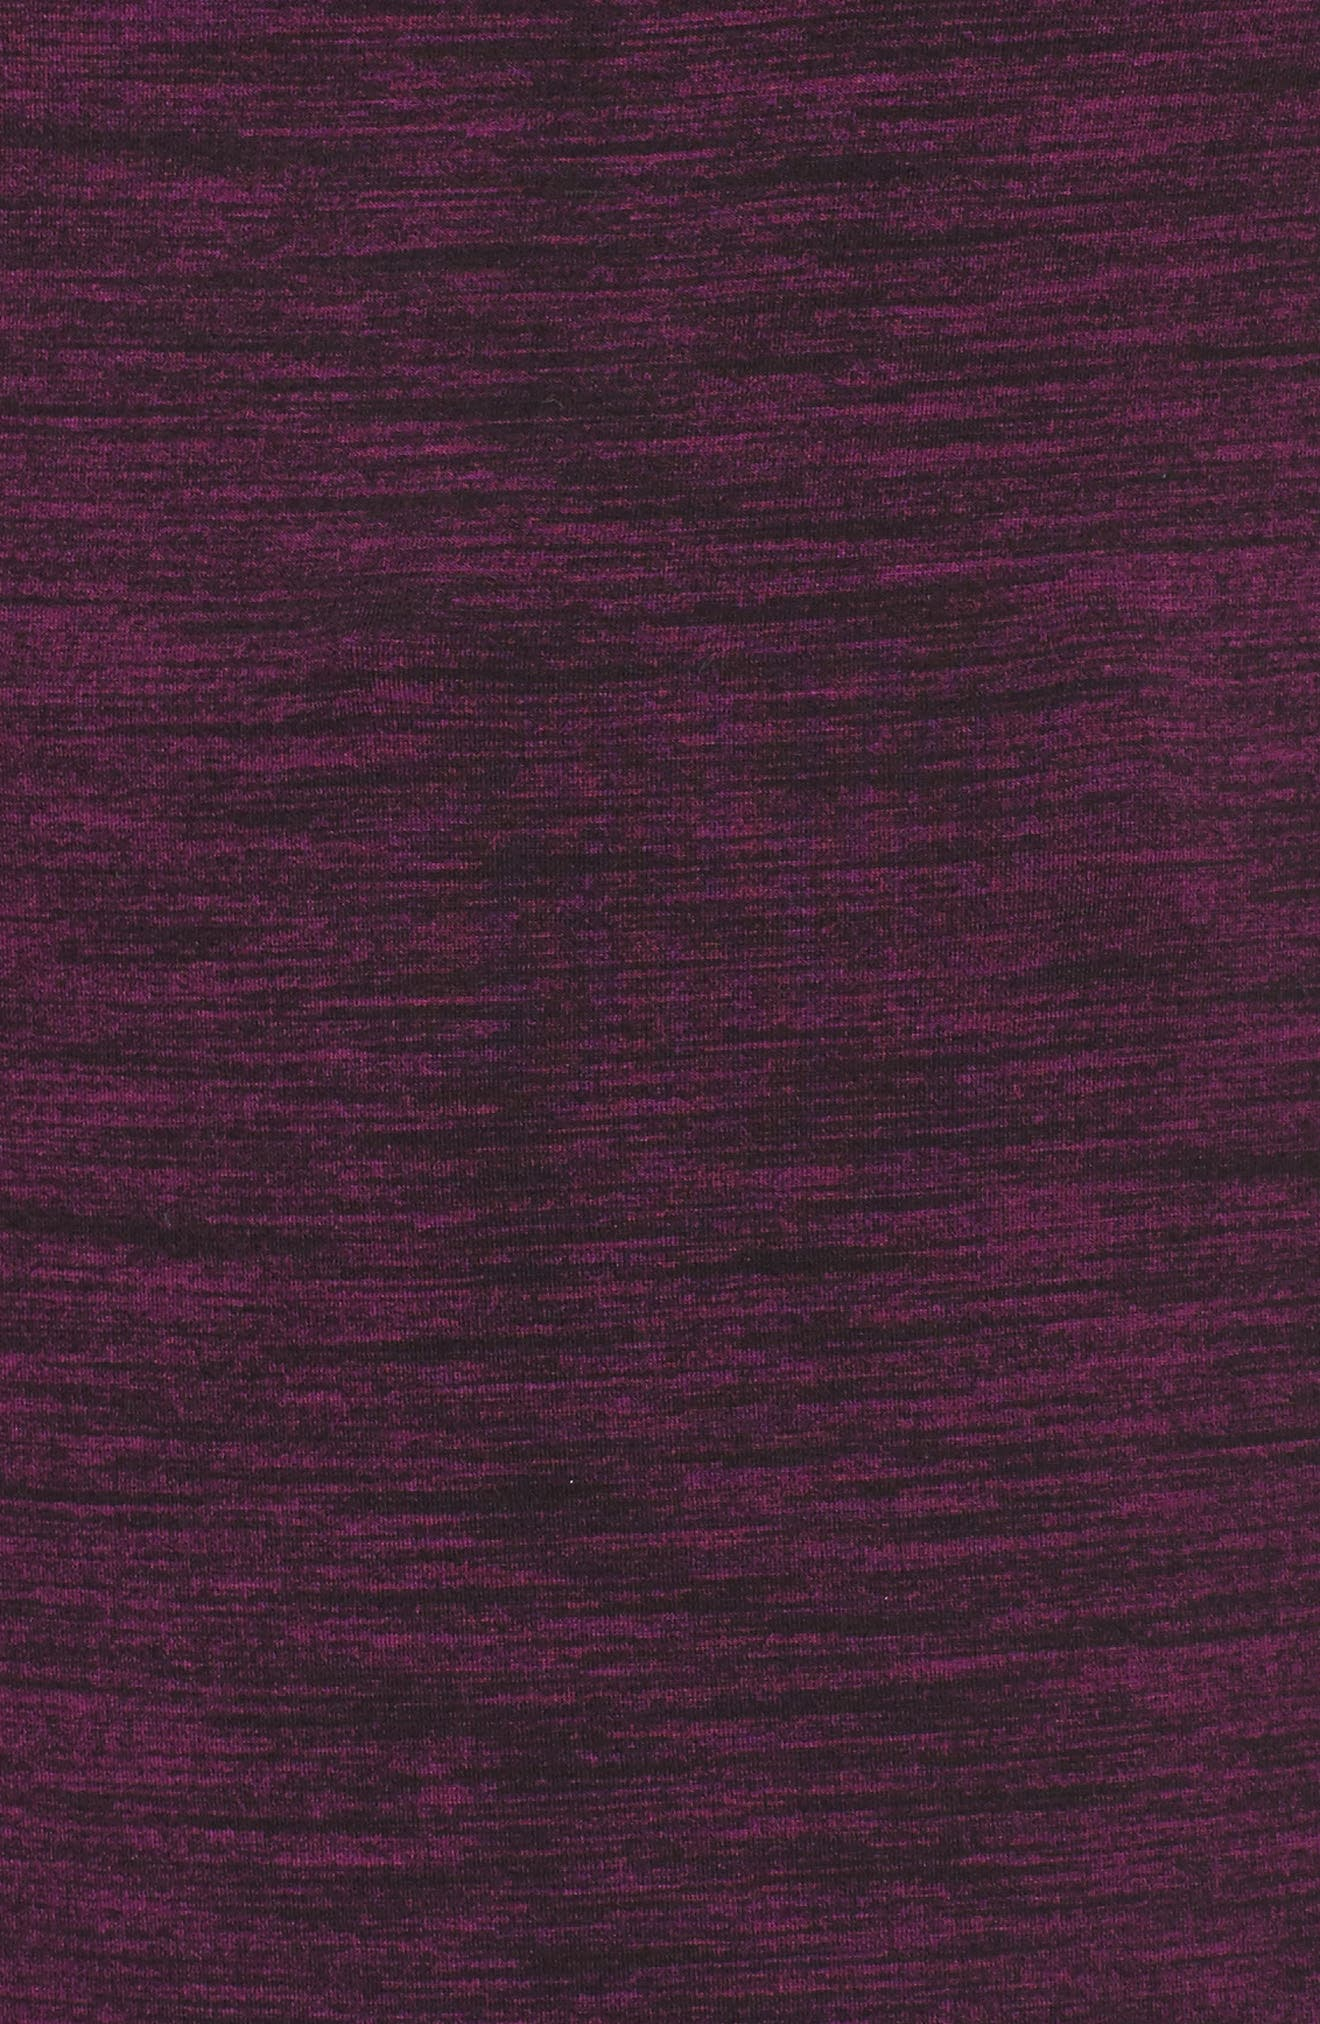 Dolman Sleeve Space Dye Tee,                             Alternate thumbnail 10, color,